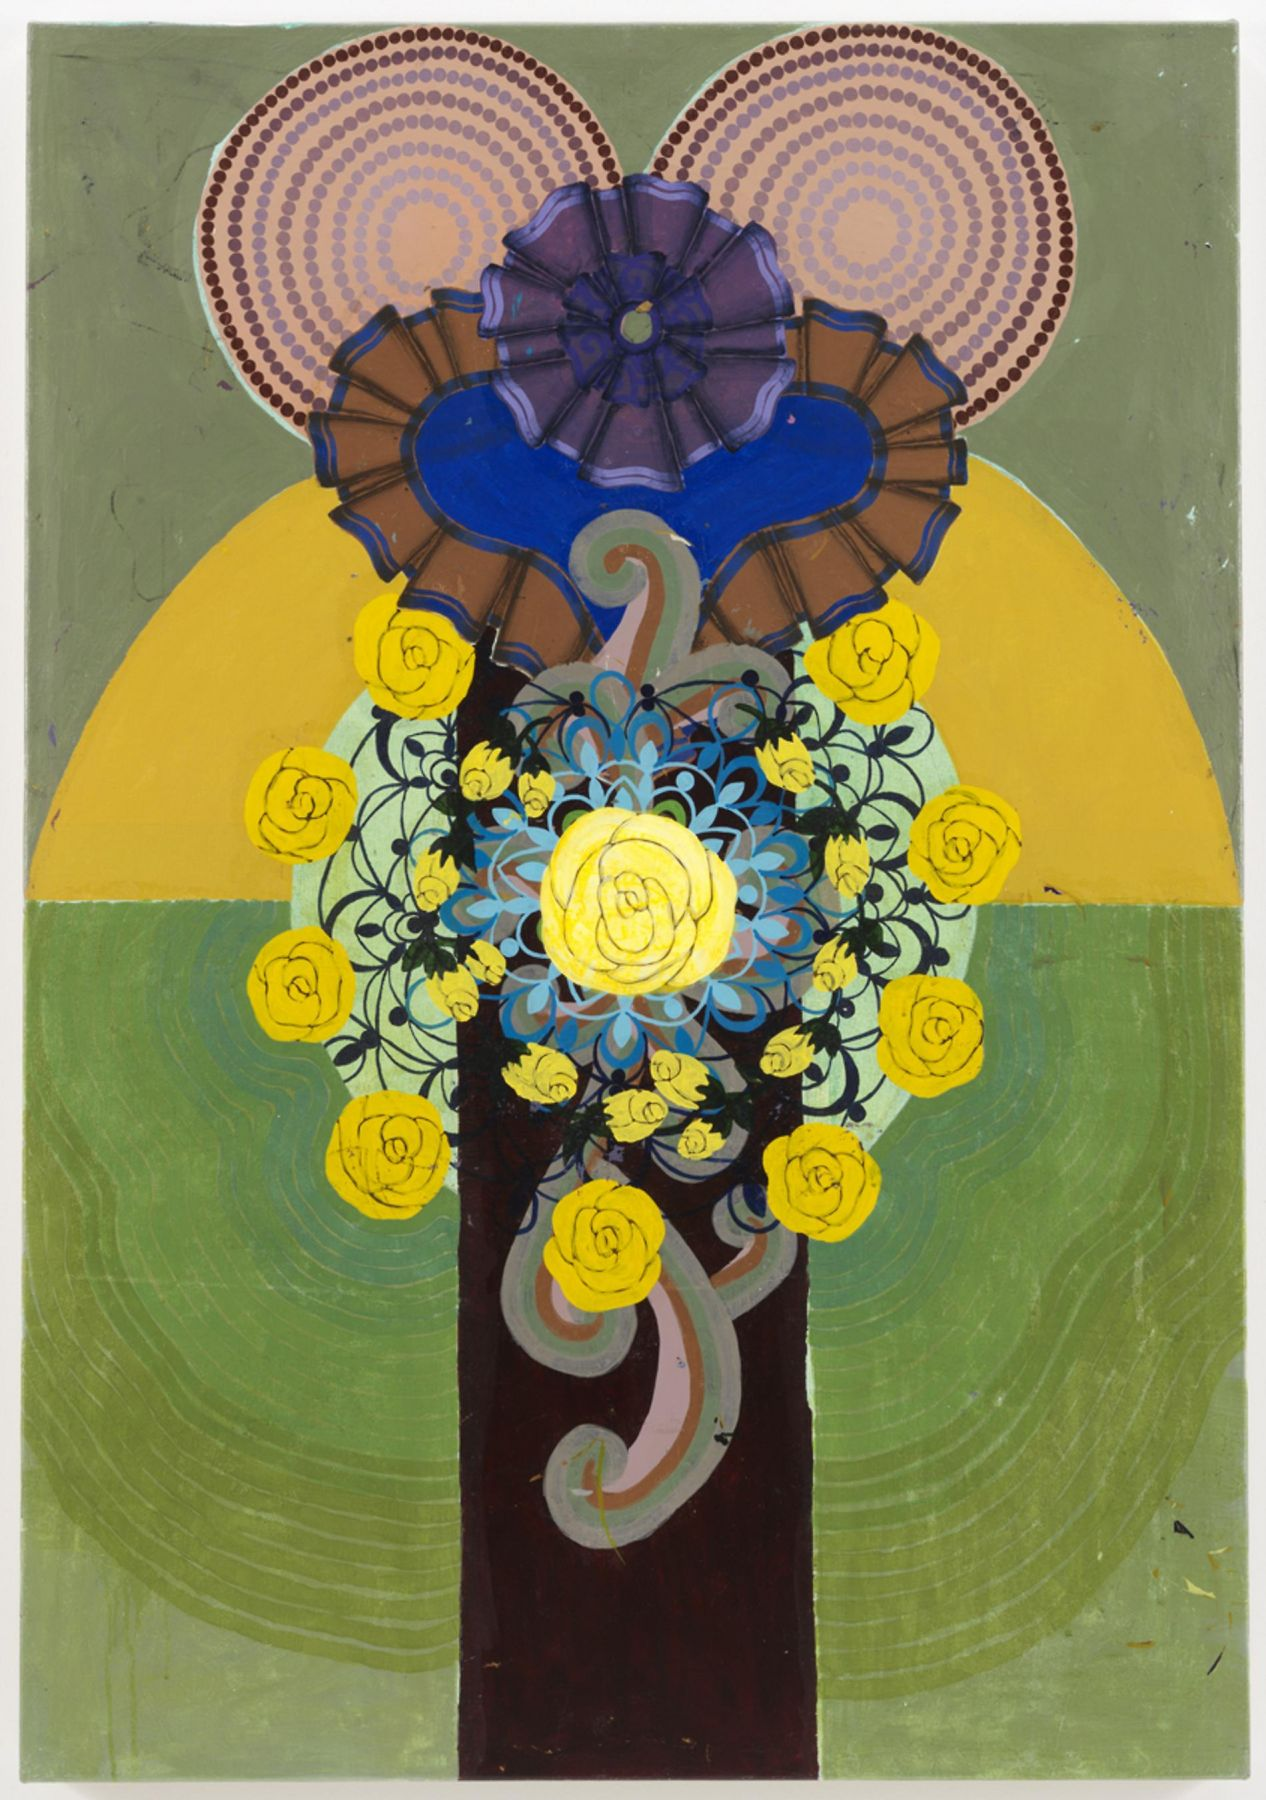 , BEATRIZ MILHAZES Ipê Rosa, 1997 Acrylic on canvas 51 x 35 1/2 in. (129.5 x 90.2 cm)